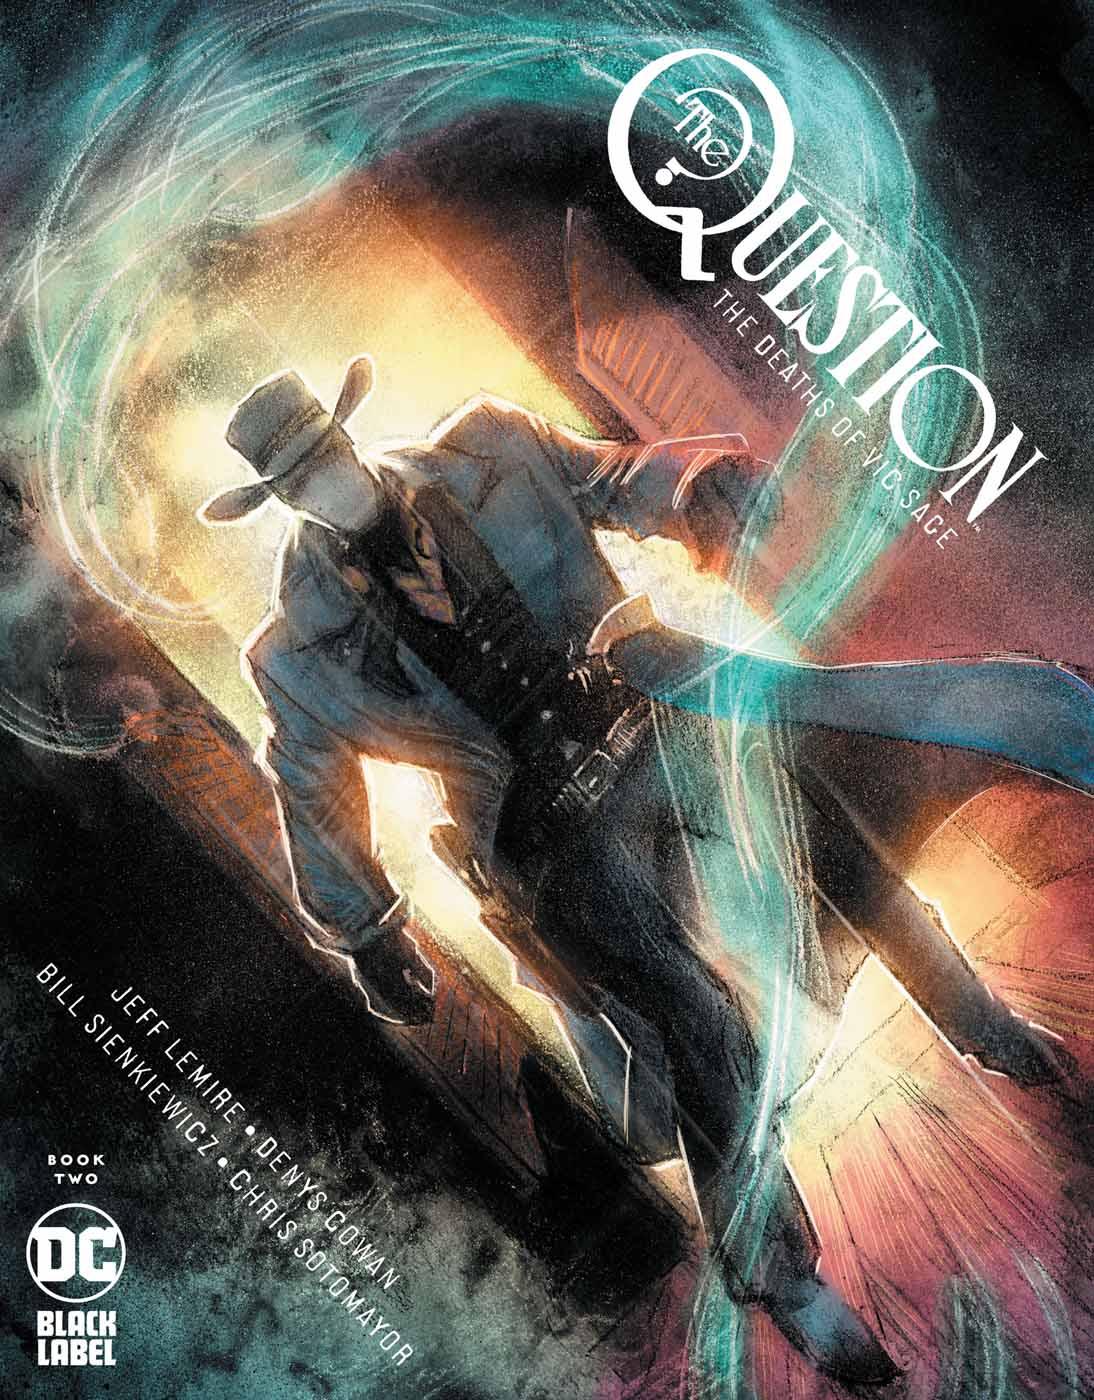 Tag 1 sur DC Earth - Forum RPG Comics E9297672a3909cc1a88ba5b6f8371874e39f97cb